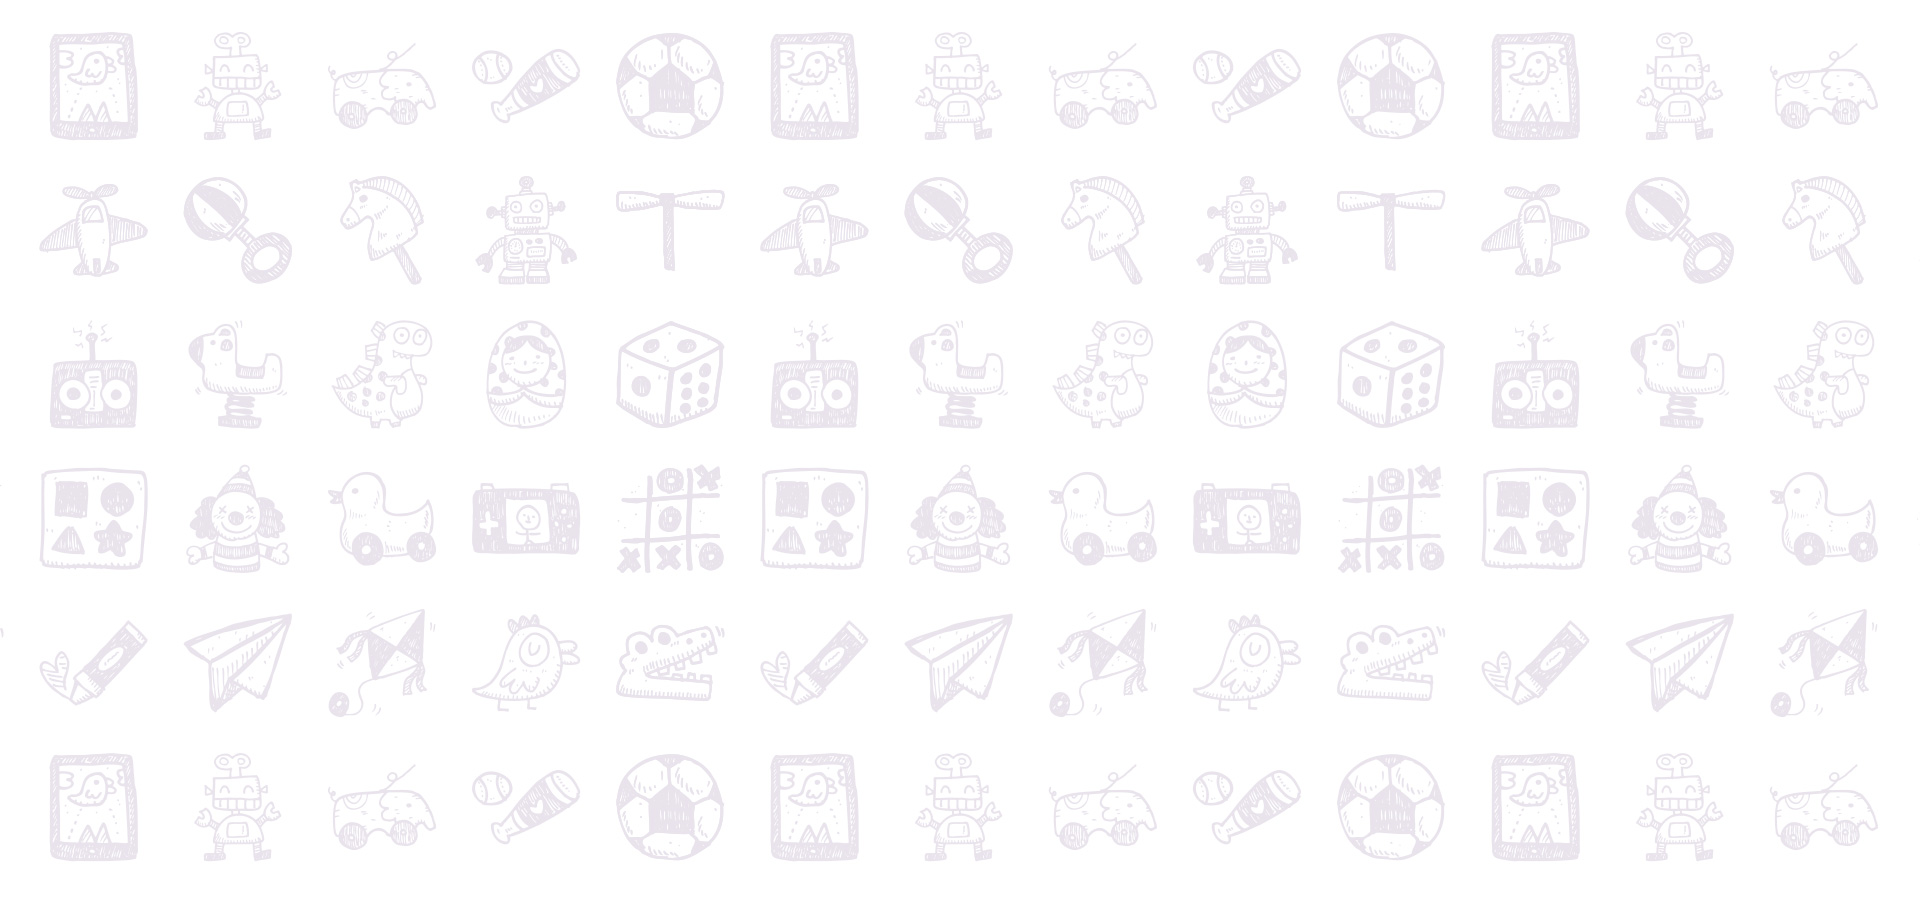 tantine-icons-plain